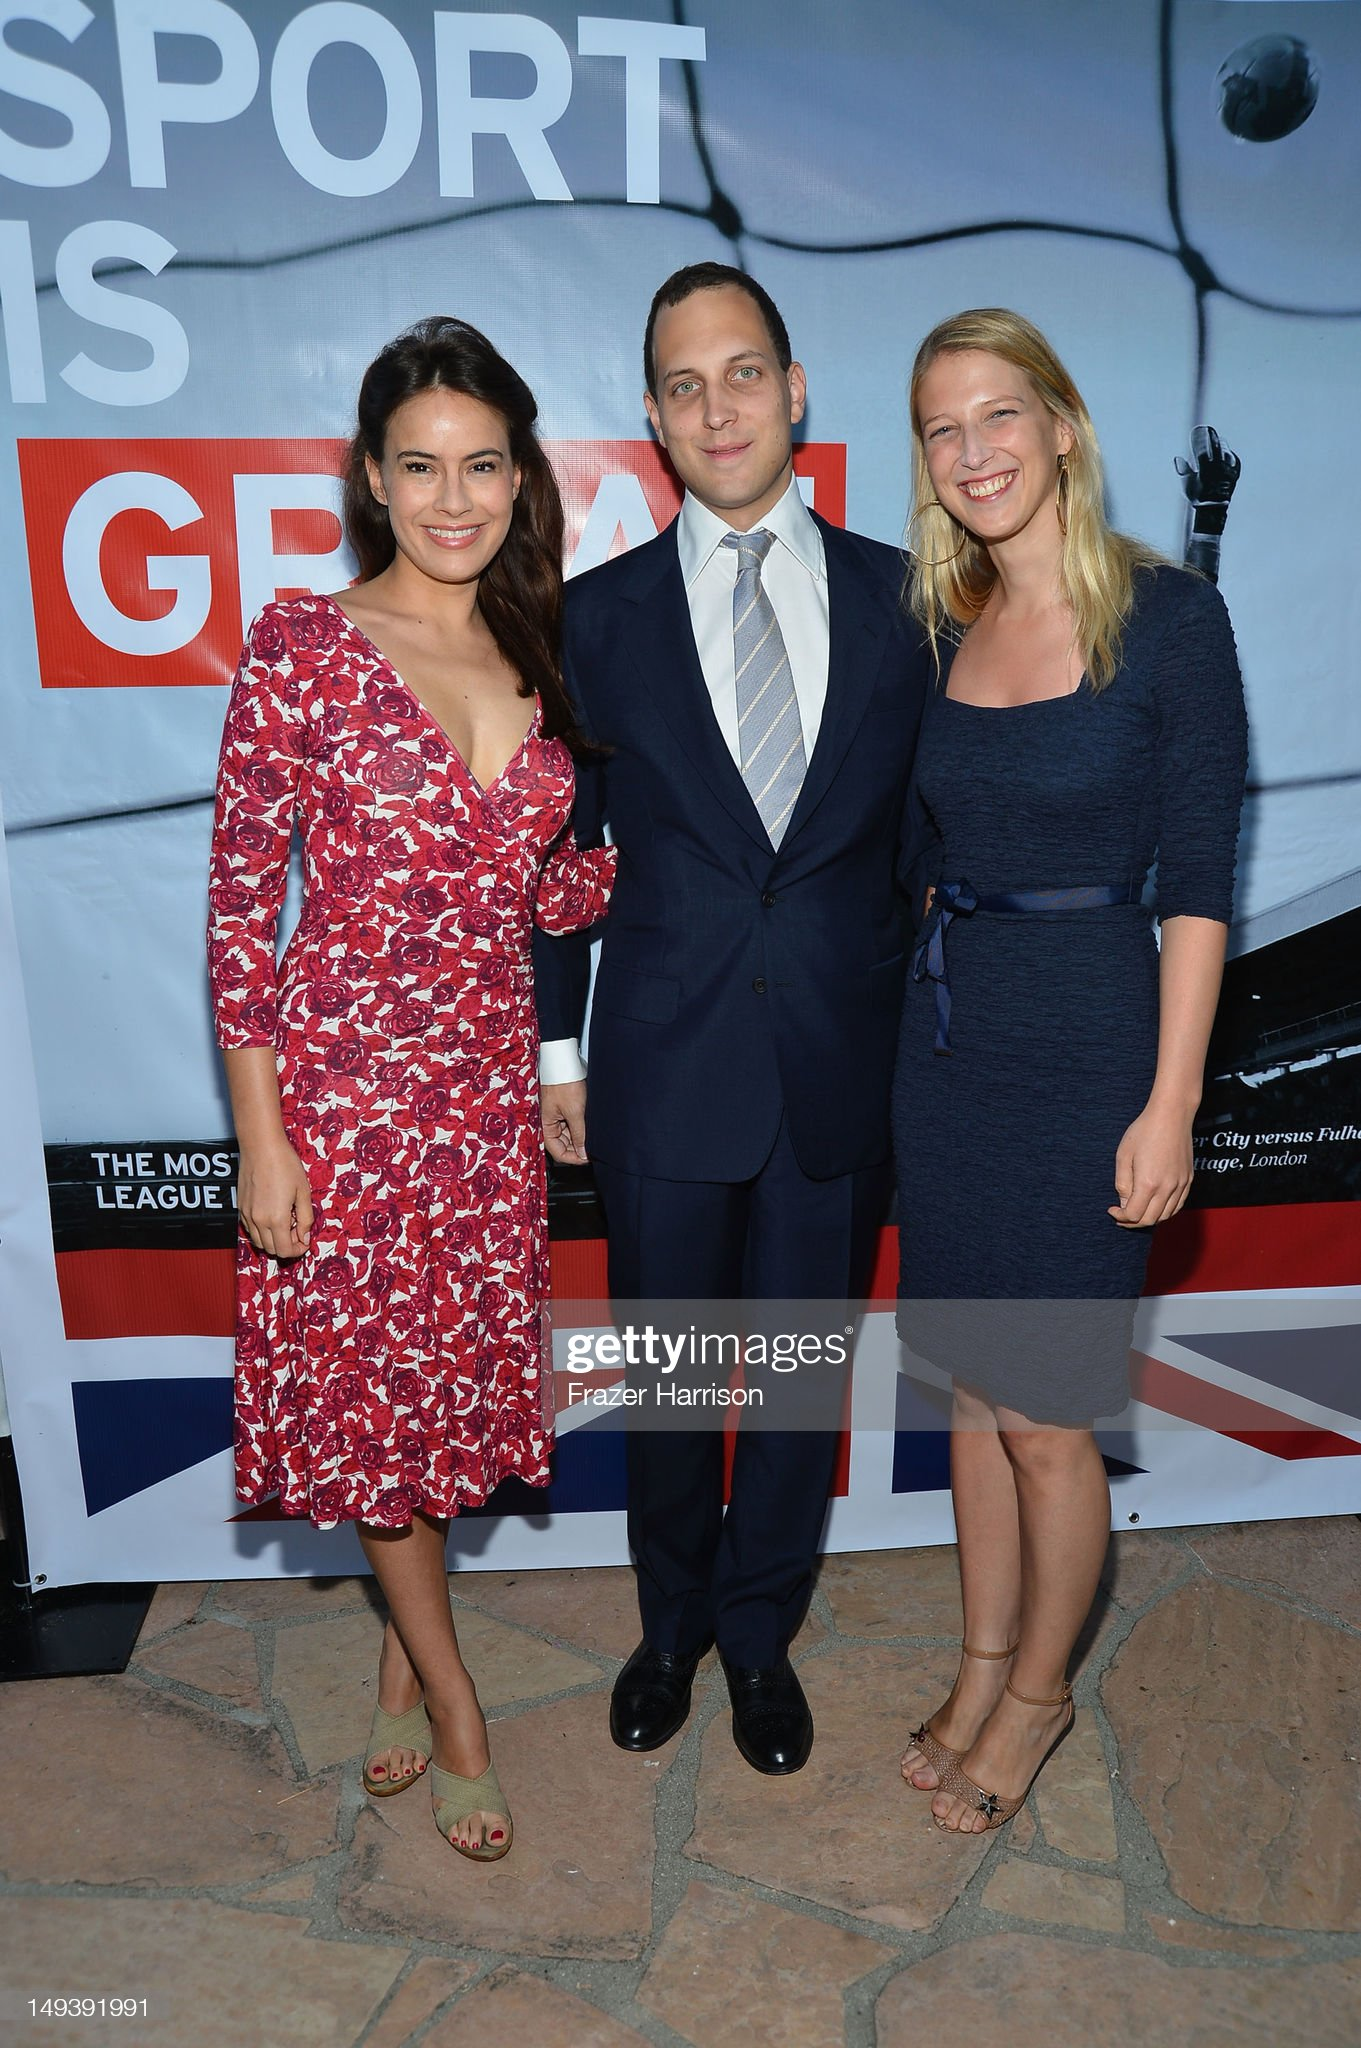 British Consulate Olympics Launch Reception : News Photo